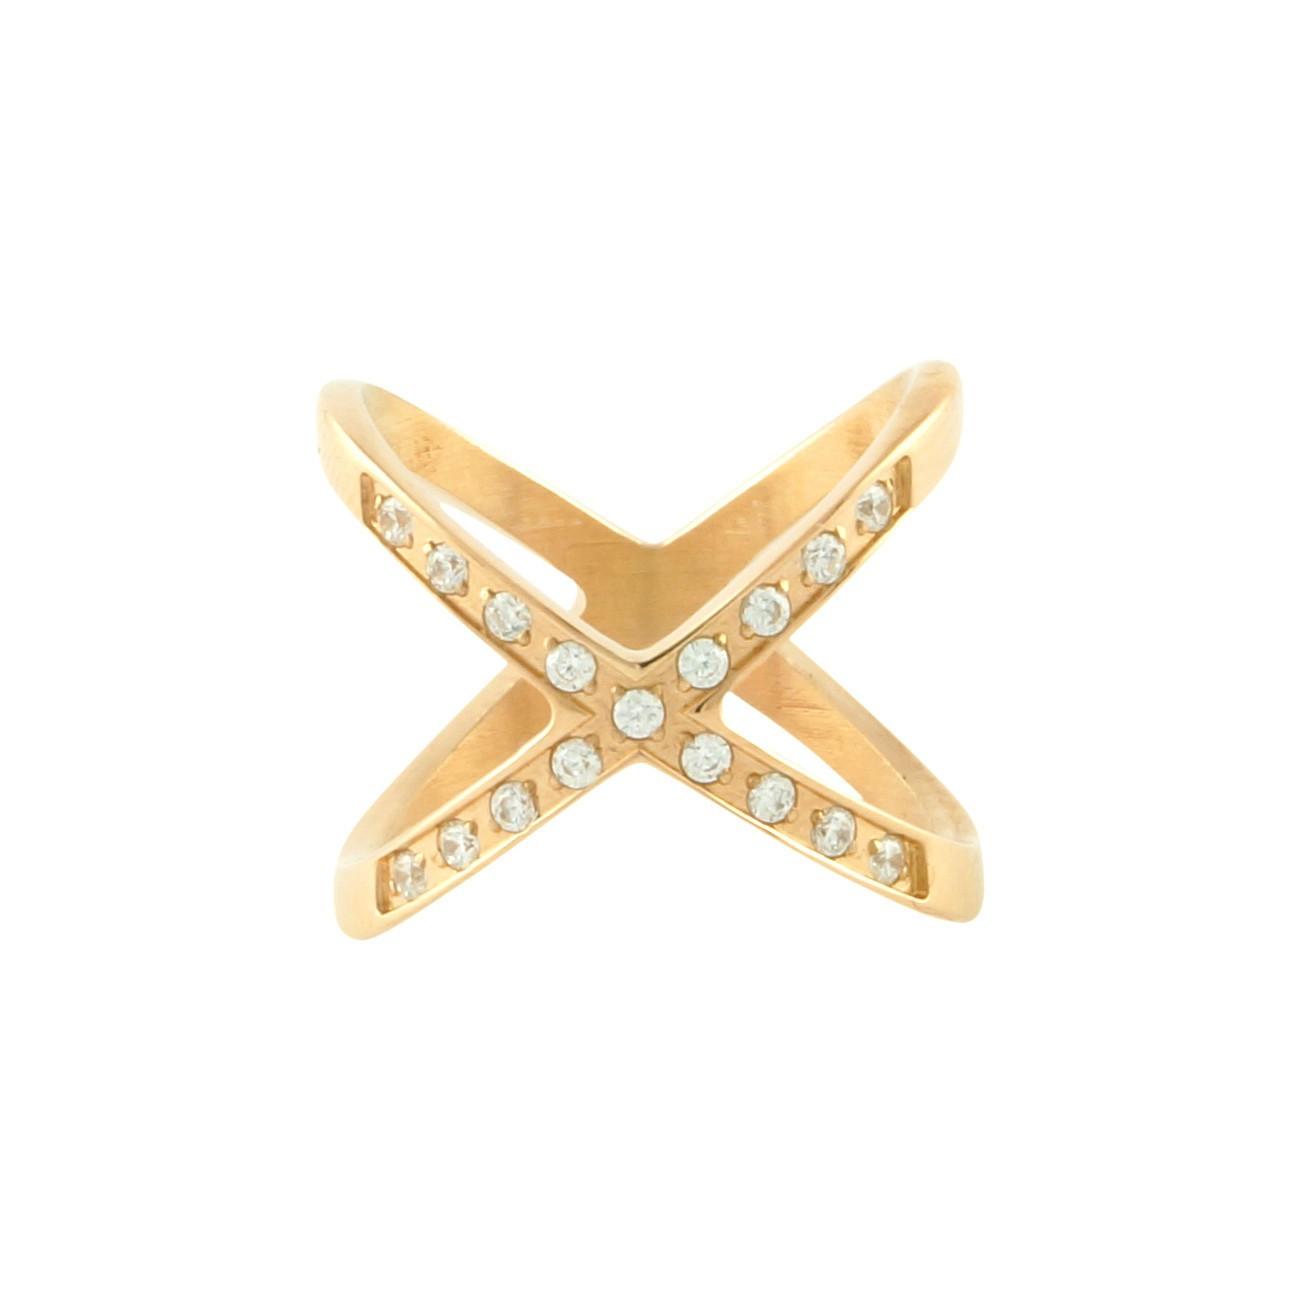 X Midi Ring | Gold plated on titanium| Dainty Ring